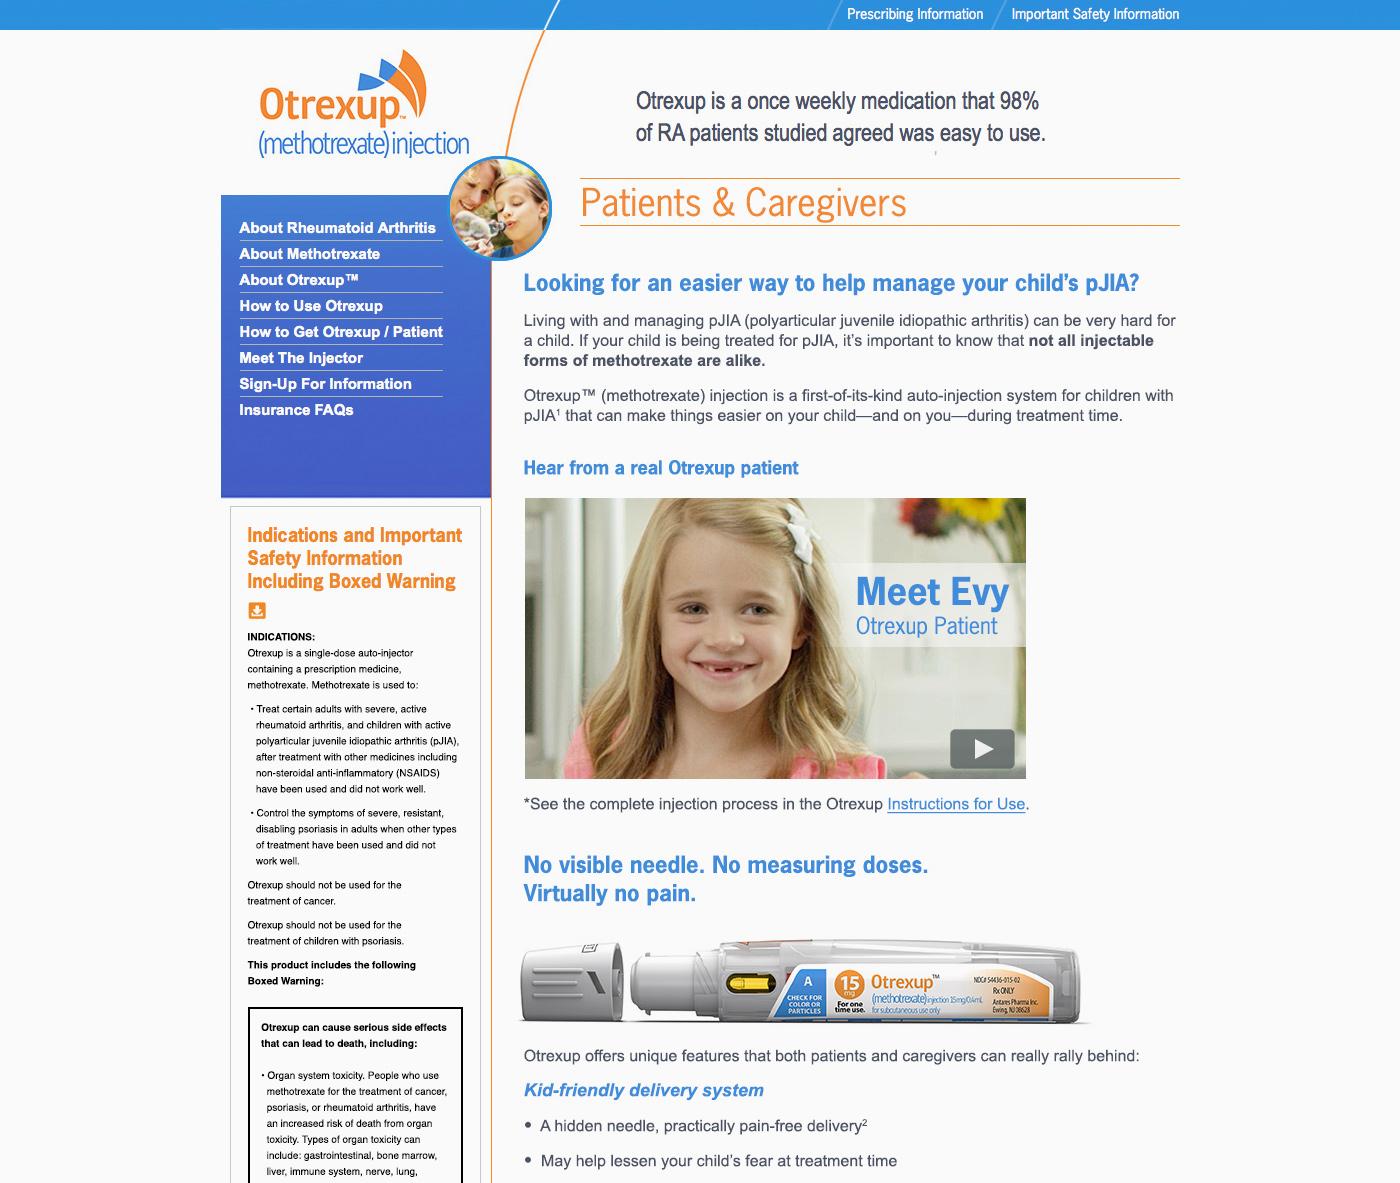 pharma brand advocacy marketing